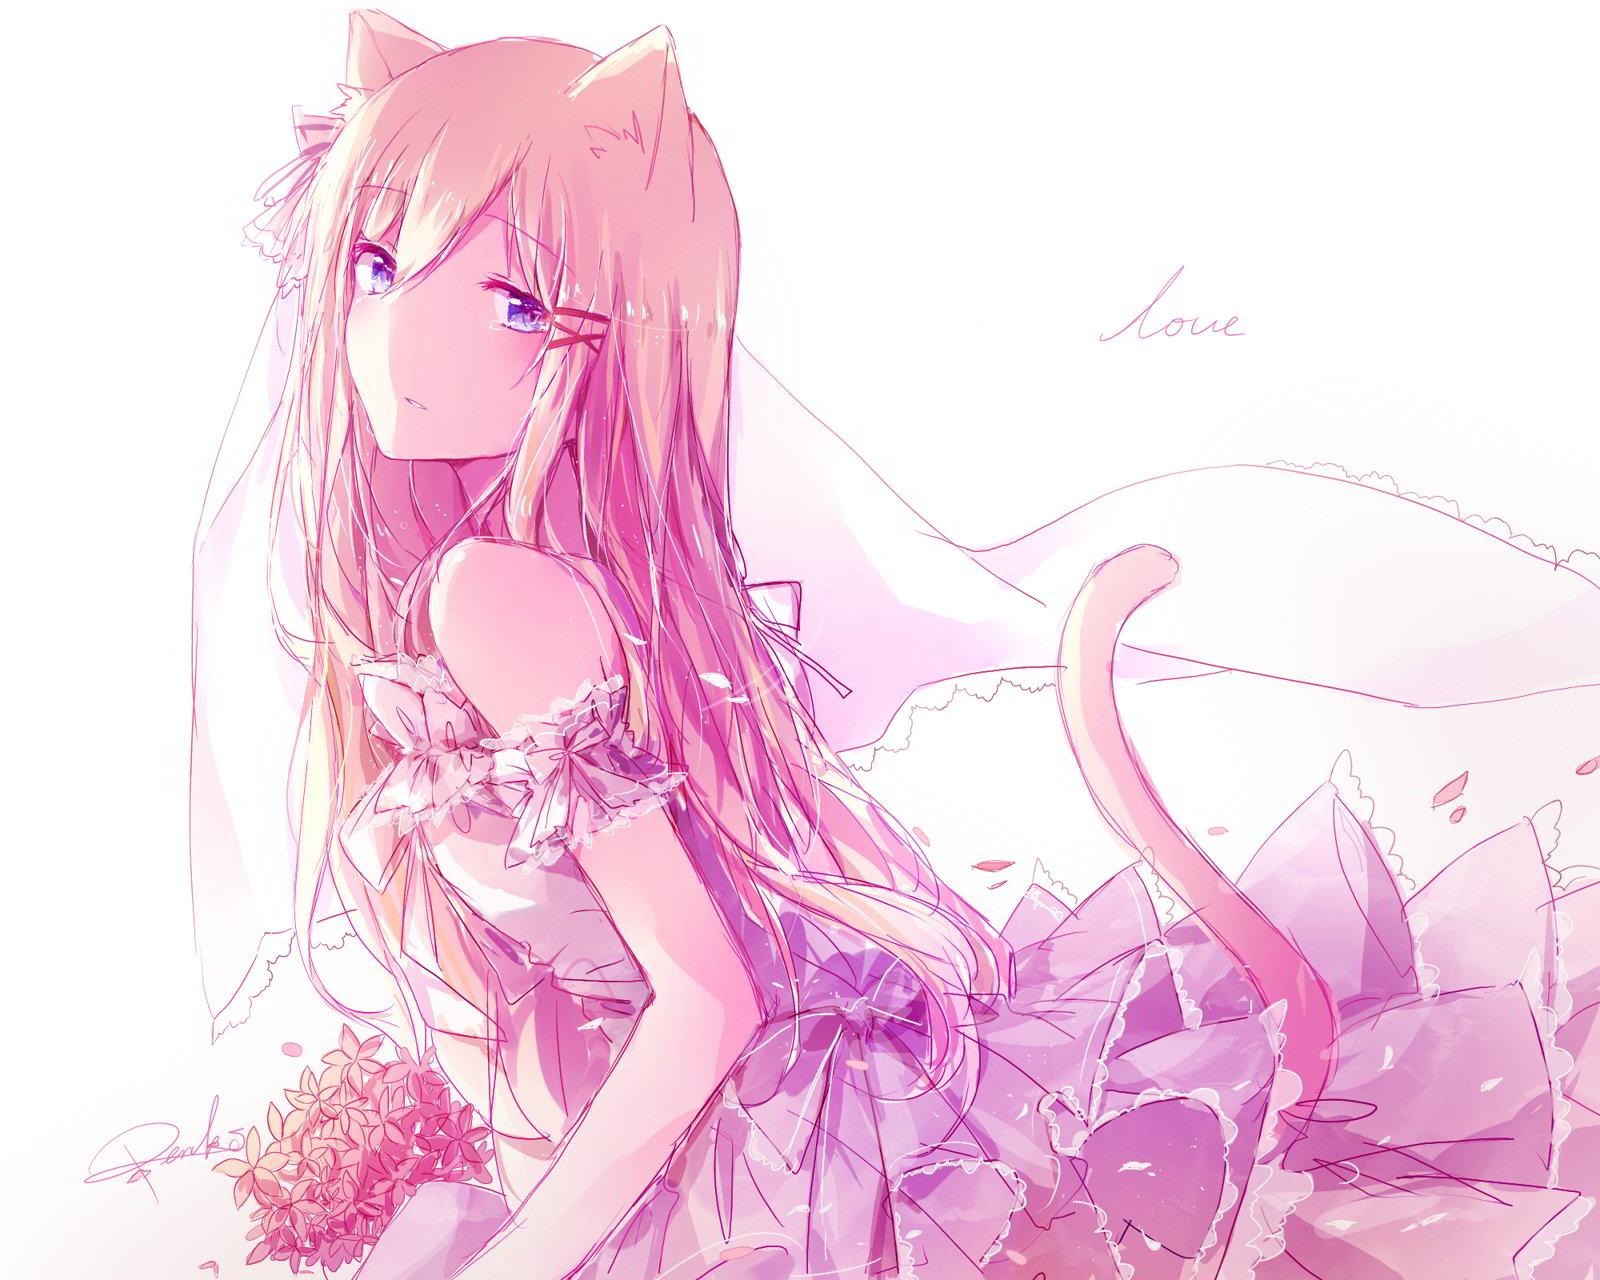 hinh nen anime girl dang yeu 5